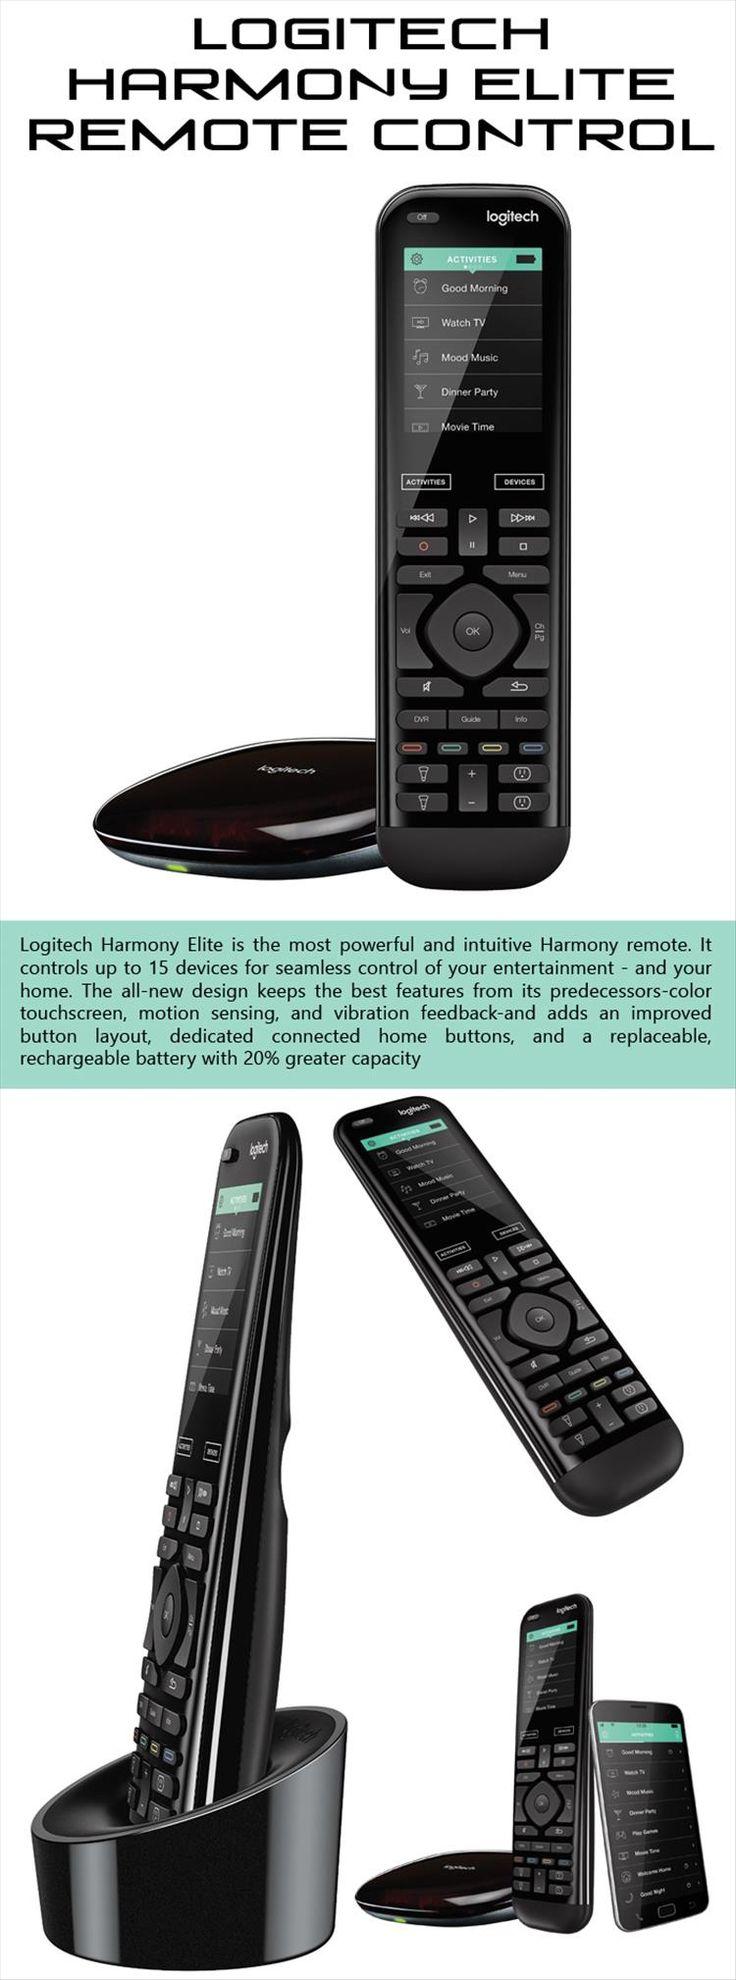 logitech-harmony-elite-remote-control